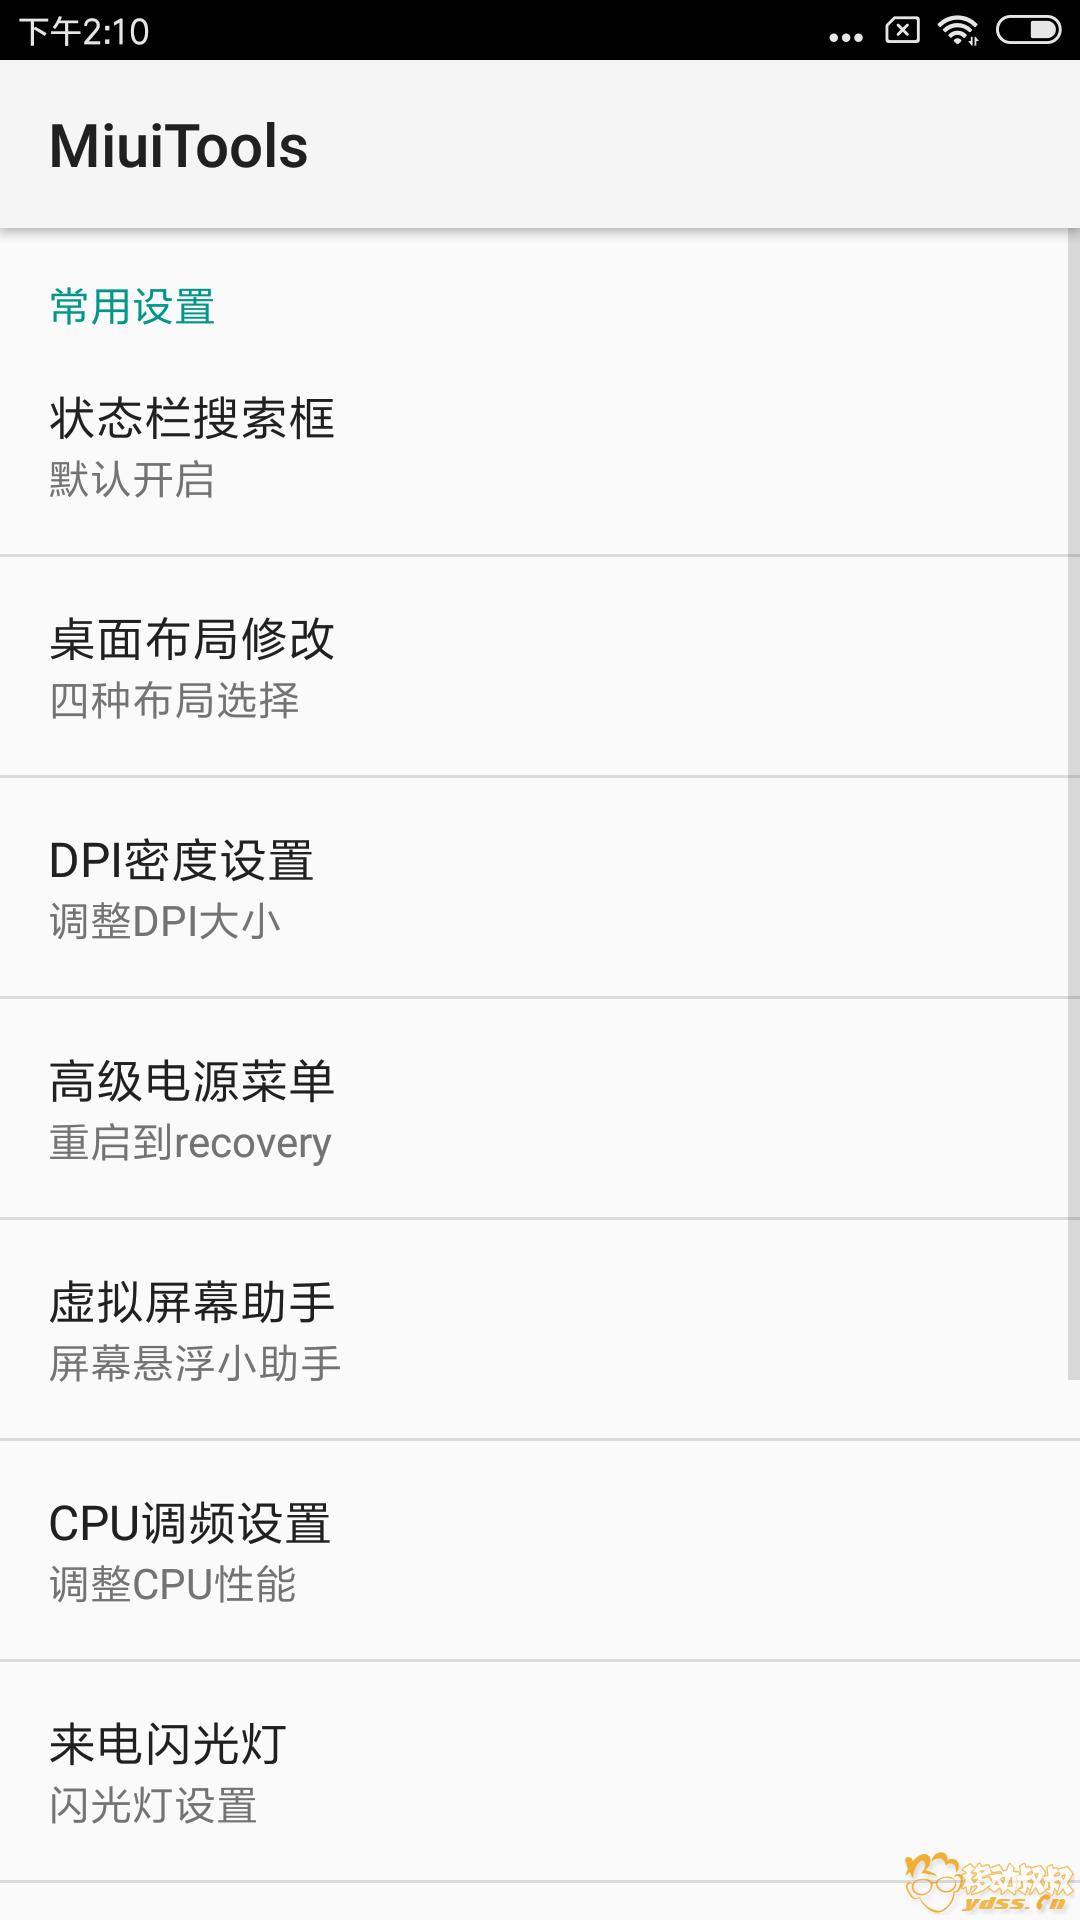 Screenshot_2018-07-10-14-10-16-962_com.anzhi.hwsettings.png